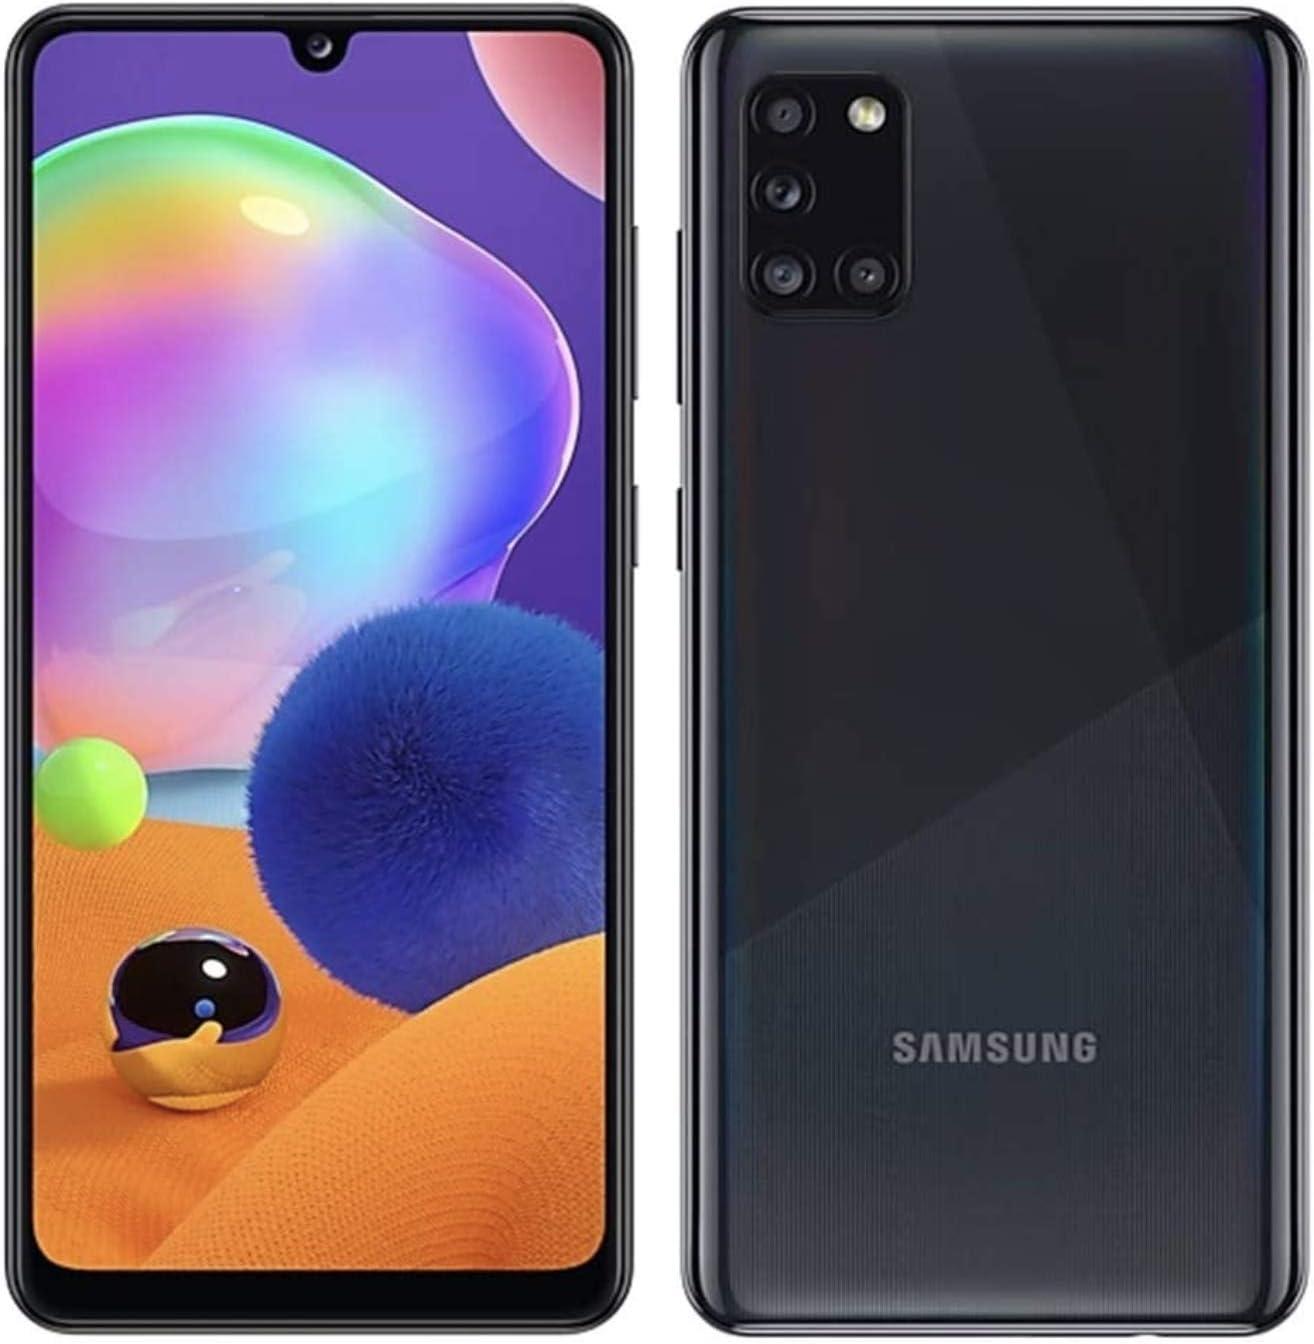 Amazon Com Samsung Galaxy A31 64gb 4gb A315g Dsl Unlocked Dual Sim Phone W Quad Camera 48mp 8mp 5mp 5mp Gsm International Version Prism Crush Black Electronics